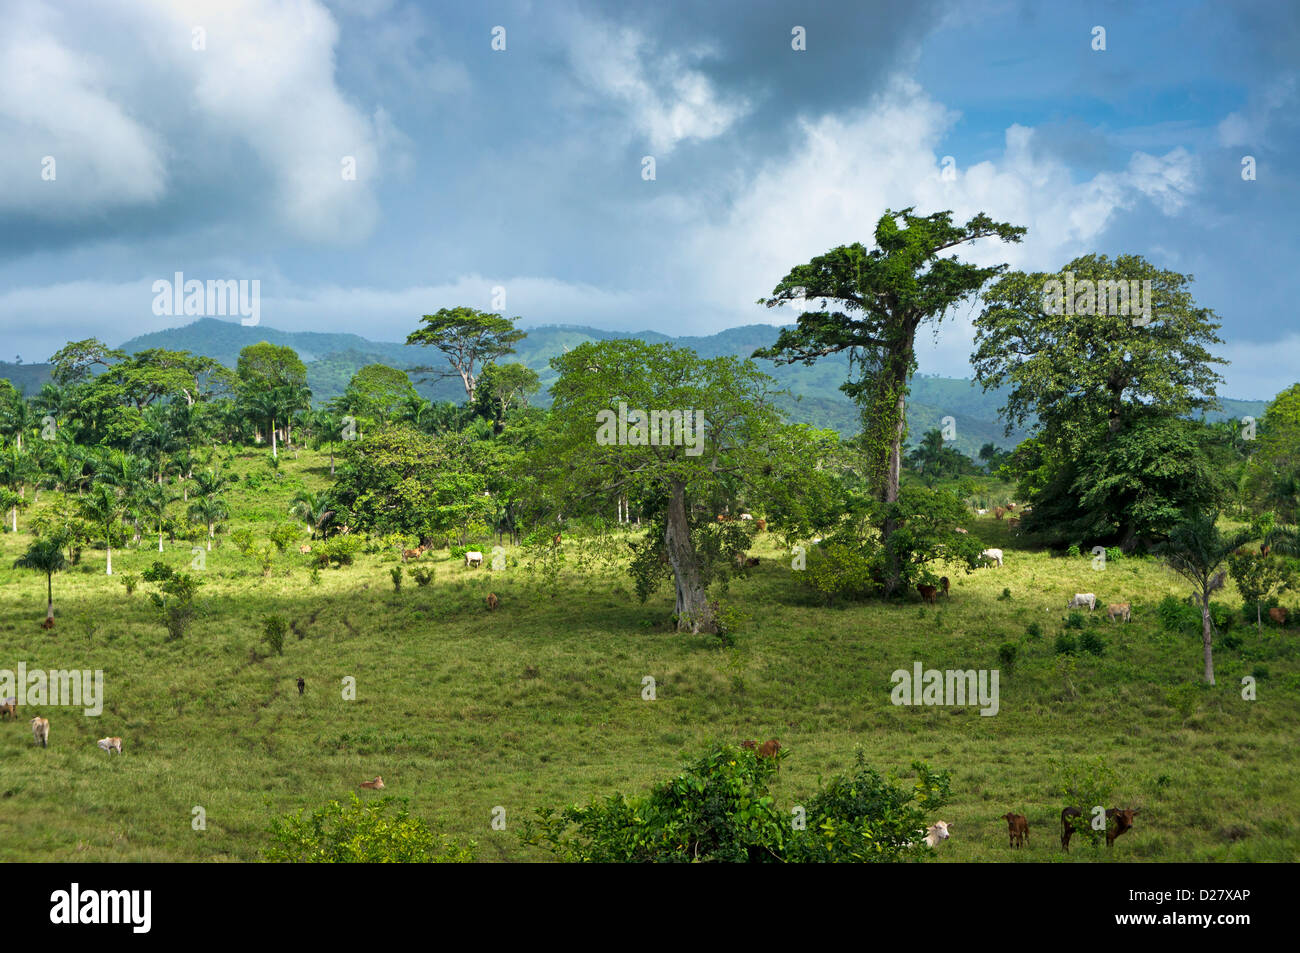 Countryside at Punta Cana, Dominican Republic, Caribbean - Stock Image